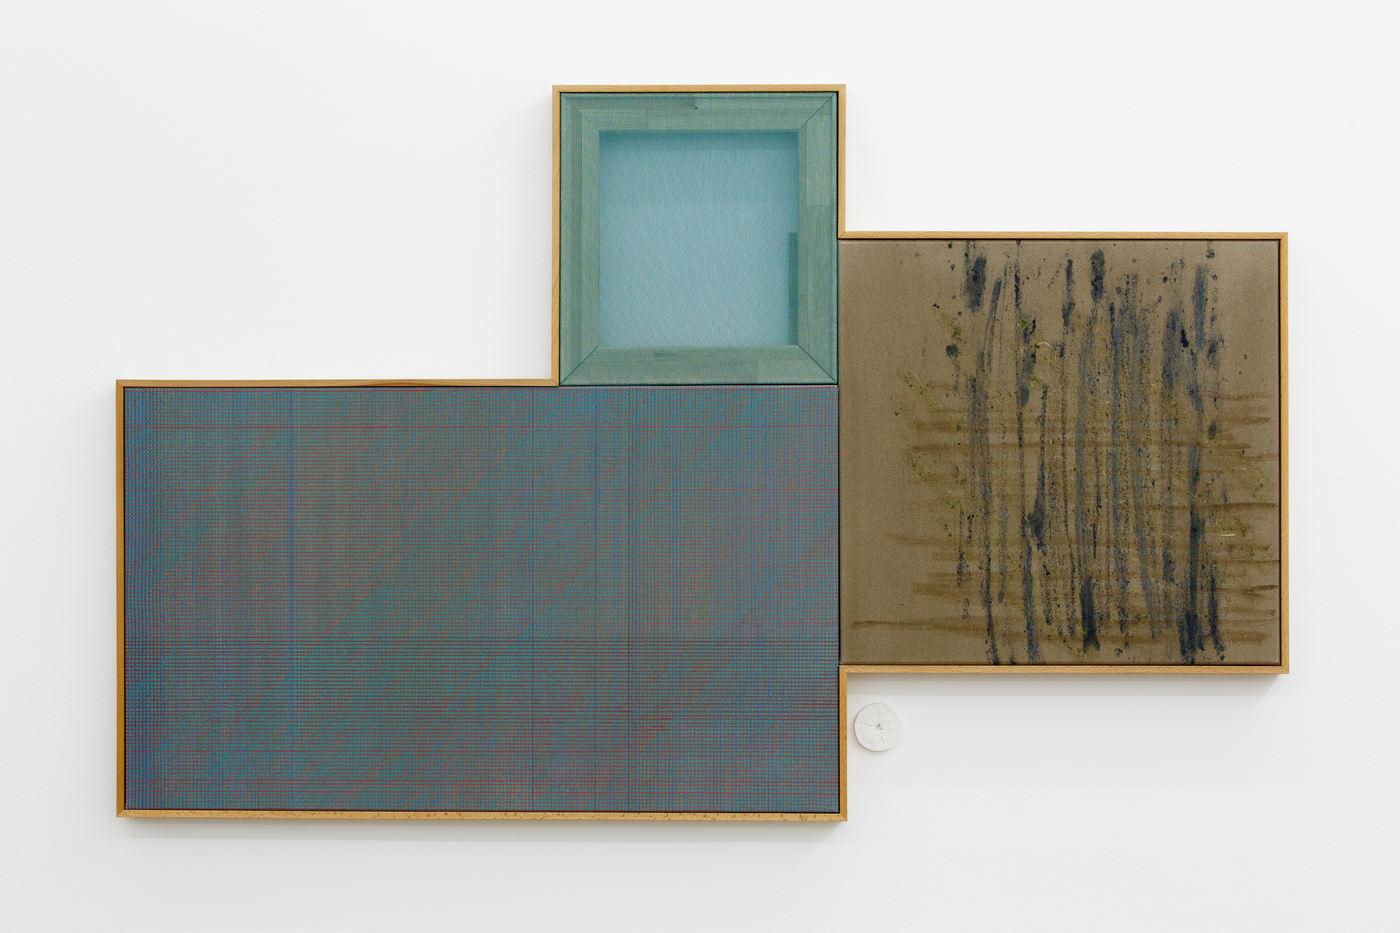 20. Radu Comsa, Atonal Geometry (Cross-Rhythms), 2015